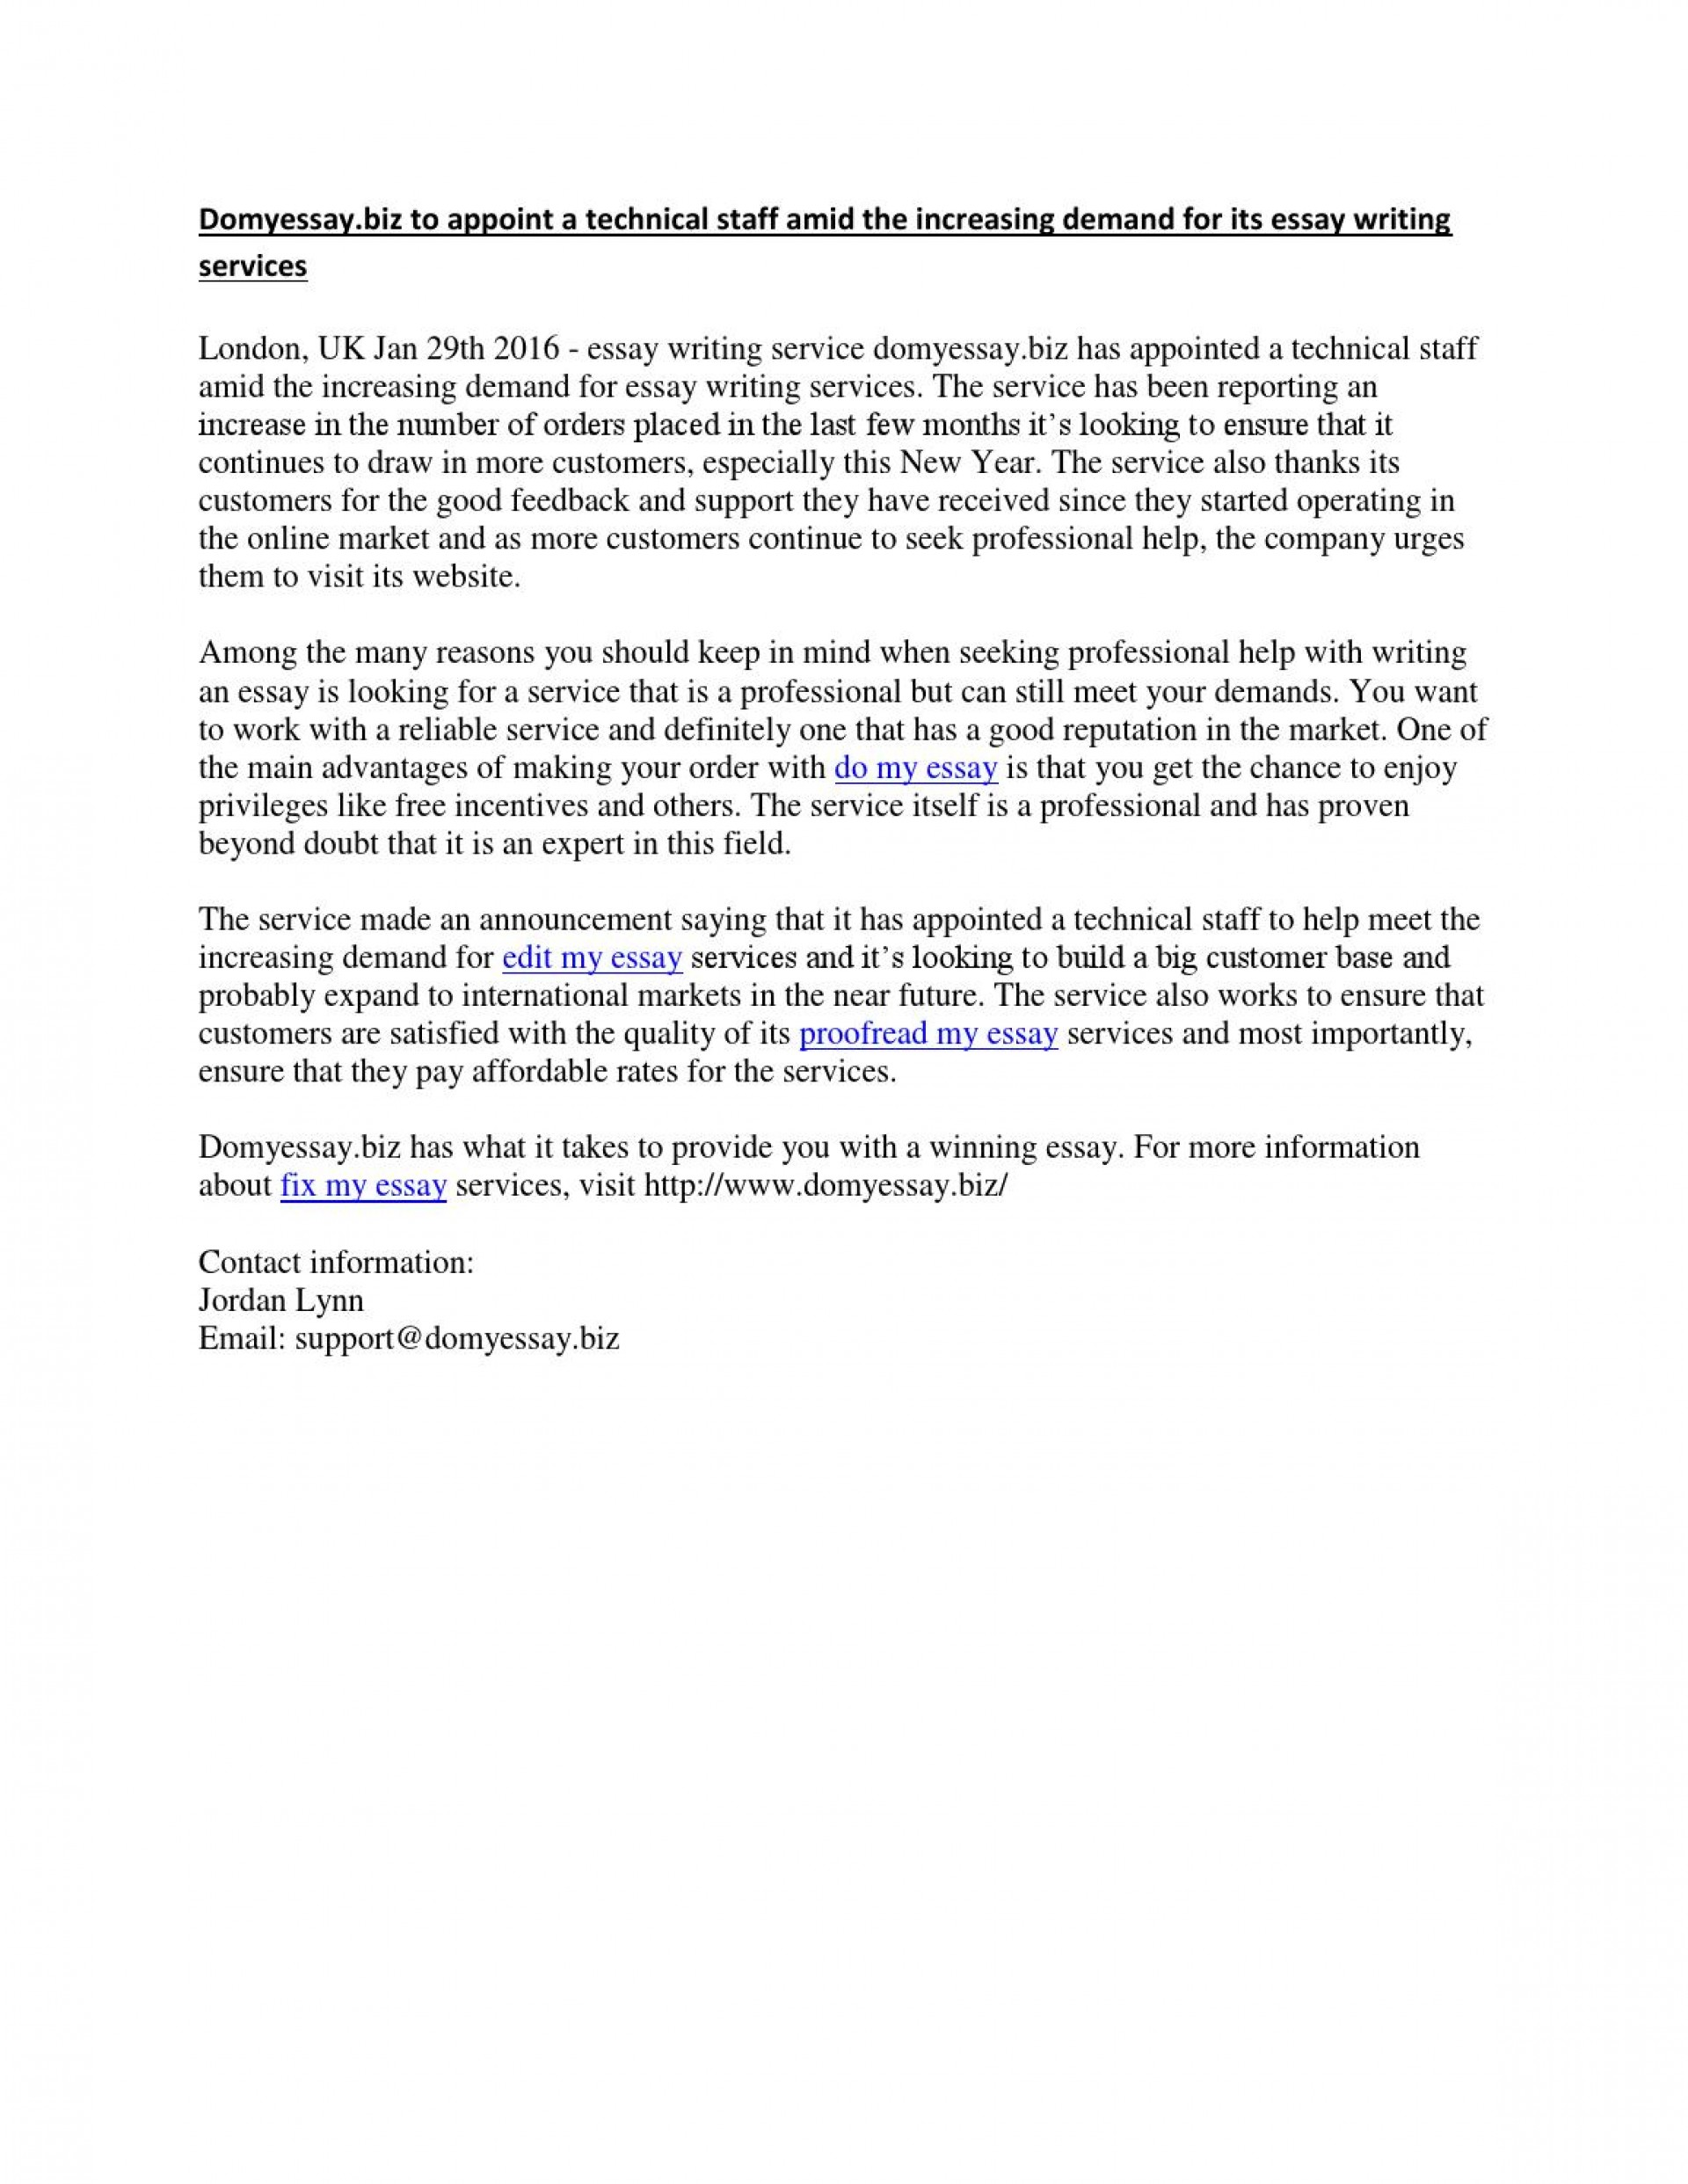 018 Essay Example Page 1 Fix Singular My Generator Free Title Online 1920